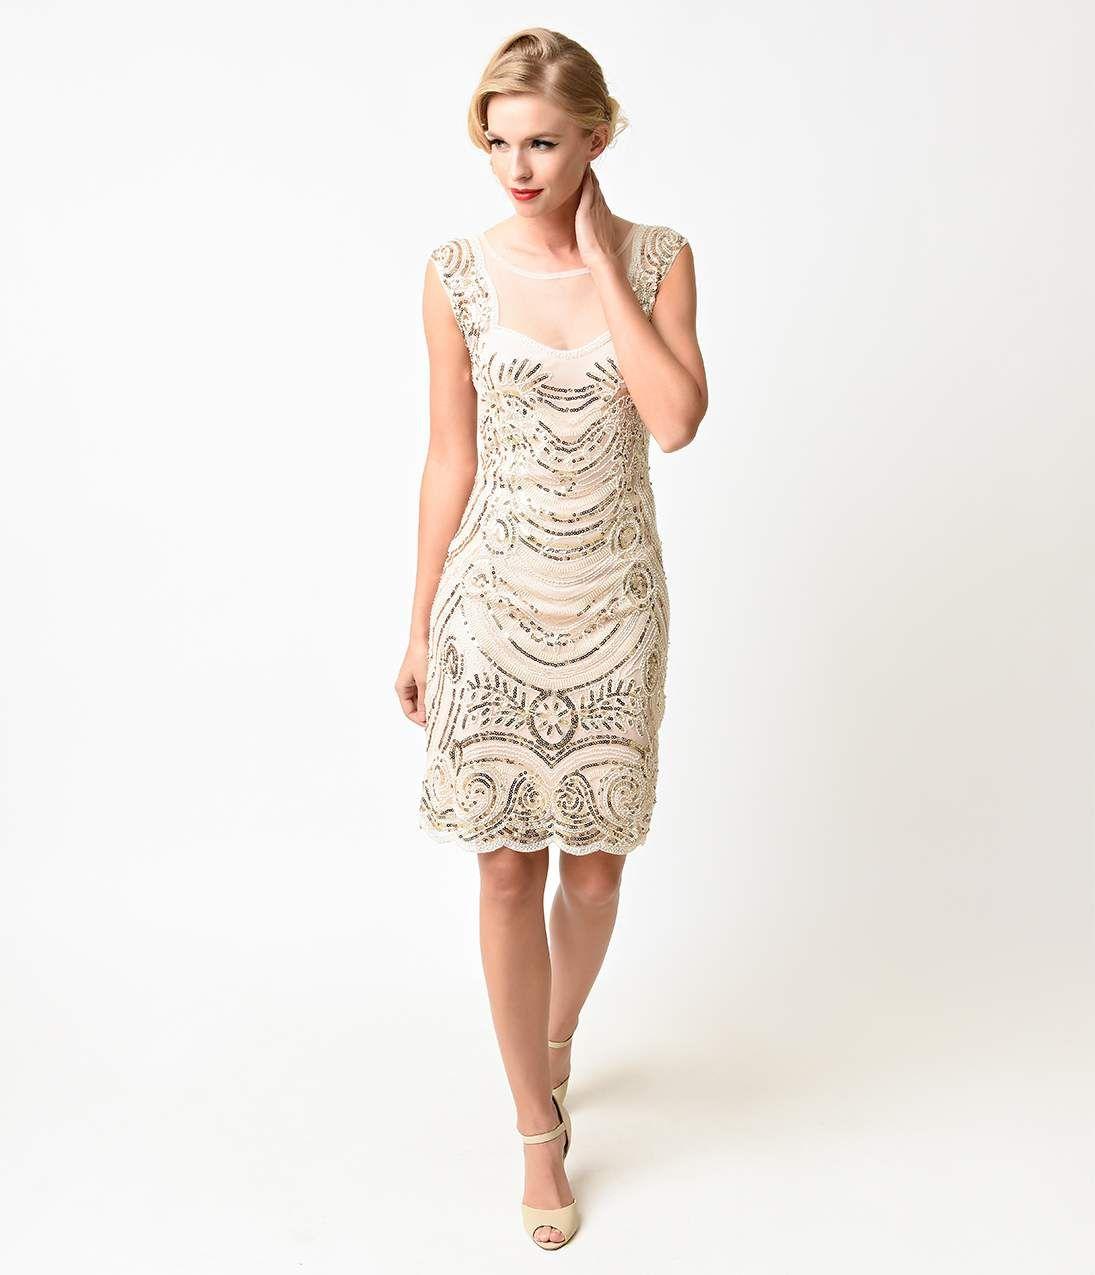 Imagen relacionada | Moda Vestidos años 20 | Pinterest | Heiraten